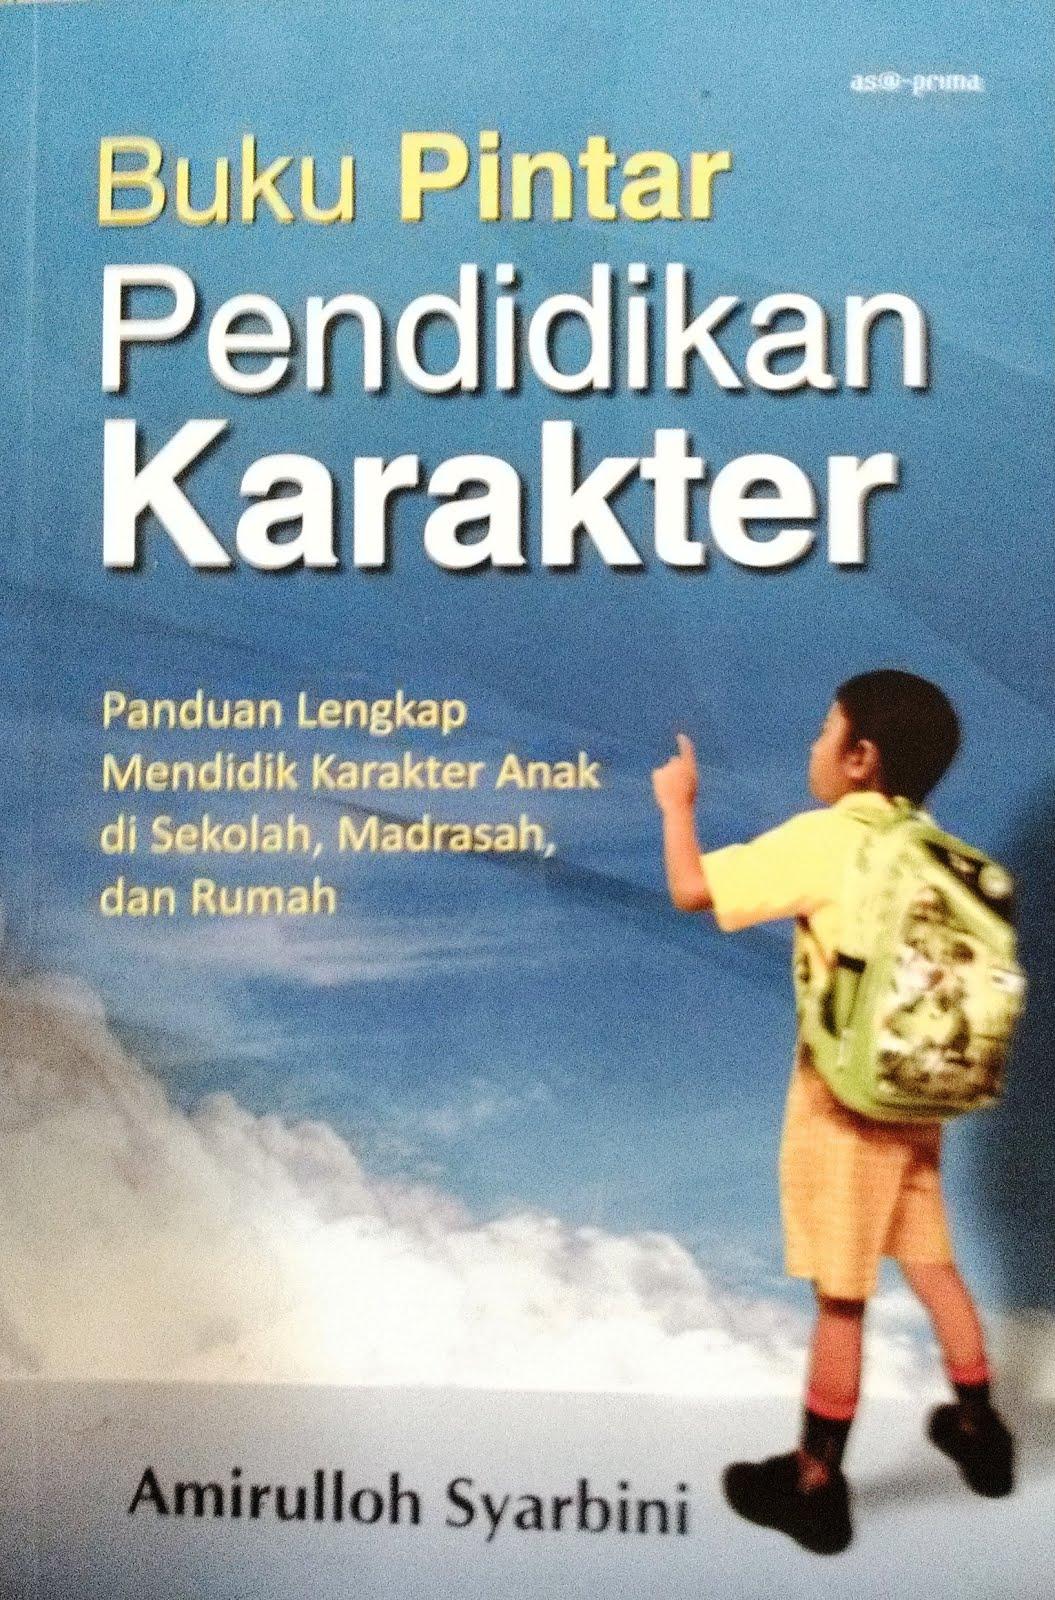 Buku Pendidikan Karakter